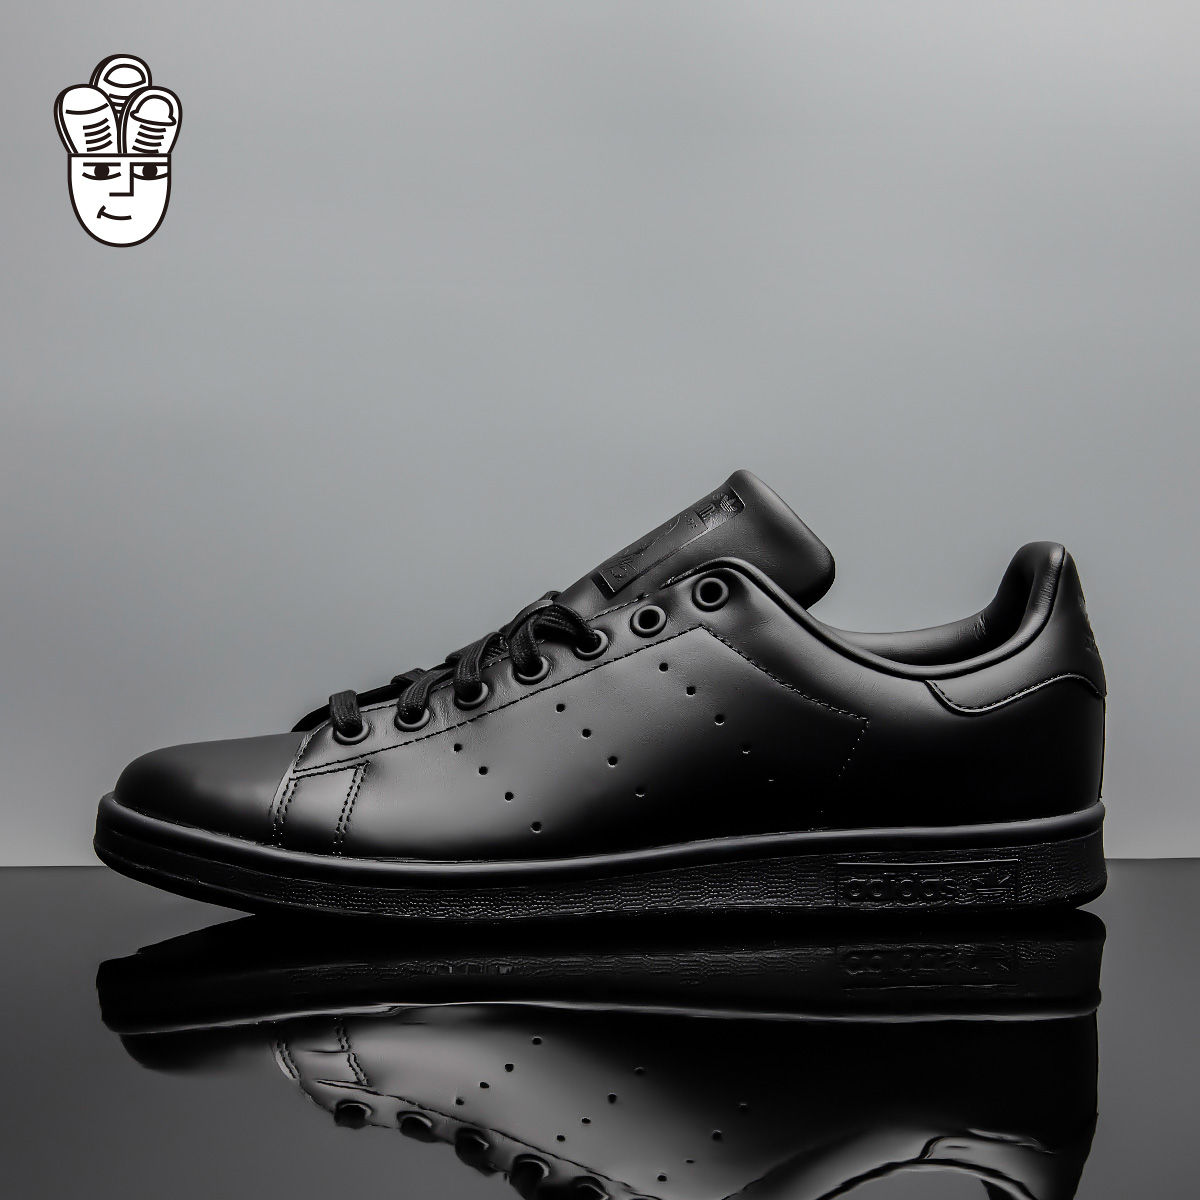 Adidas Stan Smith 三叶草男鞋 复古低帮板鞋 运动休闲鞋